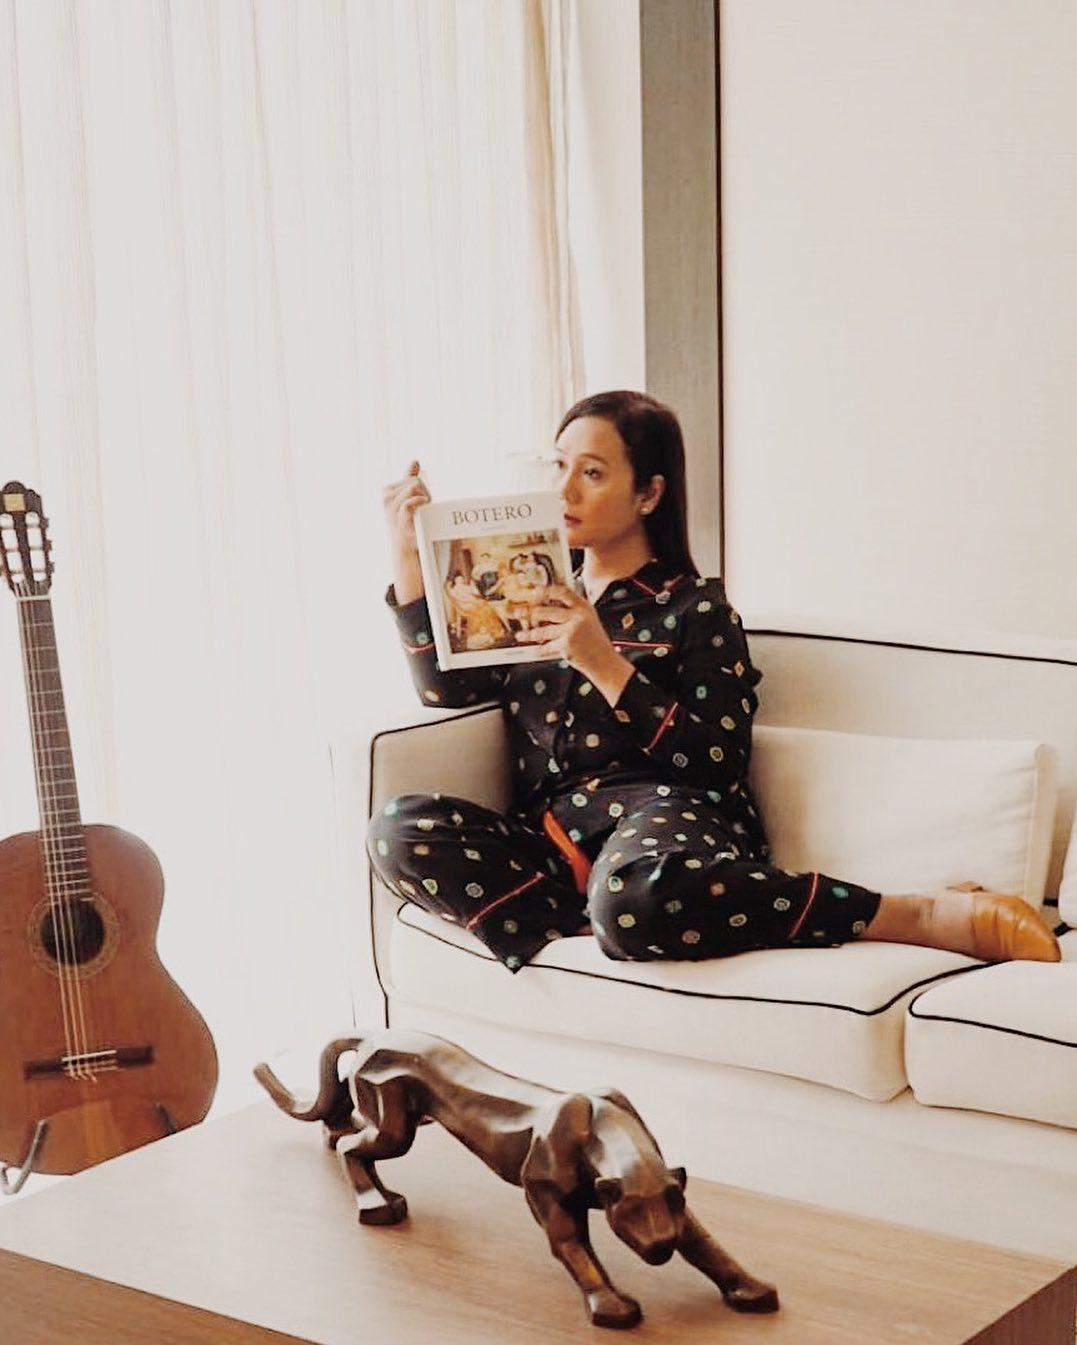 sherrypipi1904 - Singapore influencer - May 2020